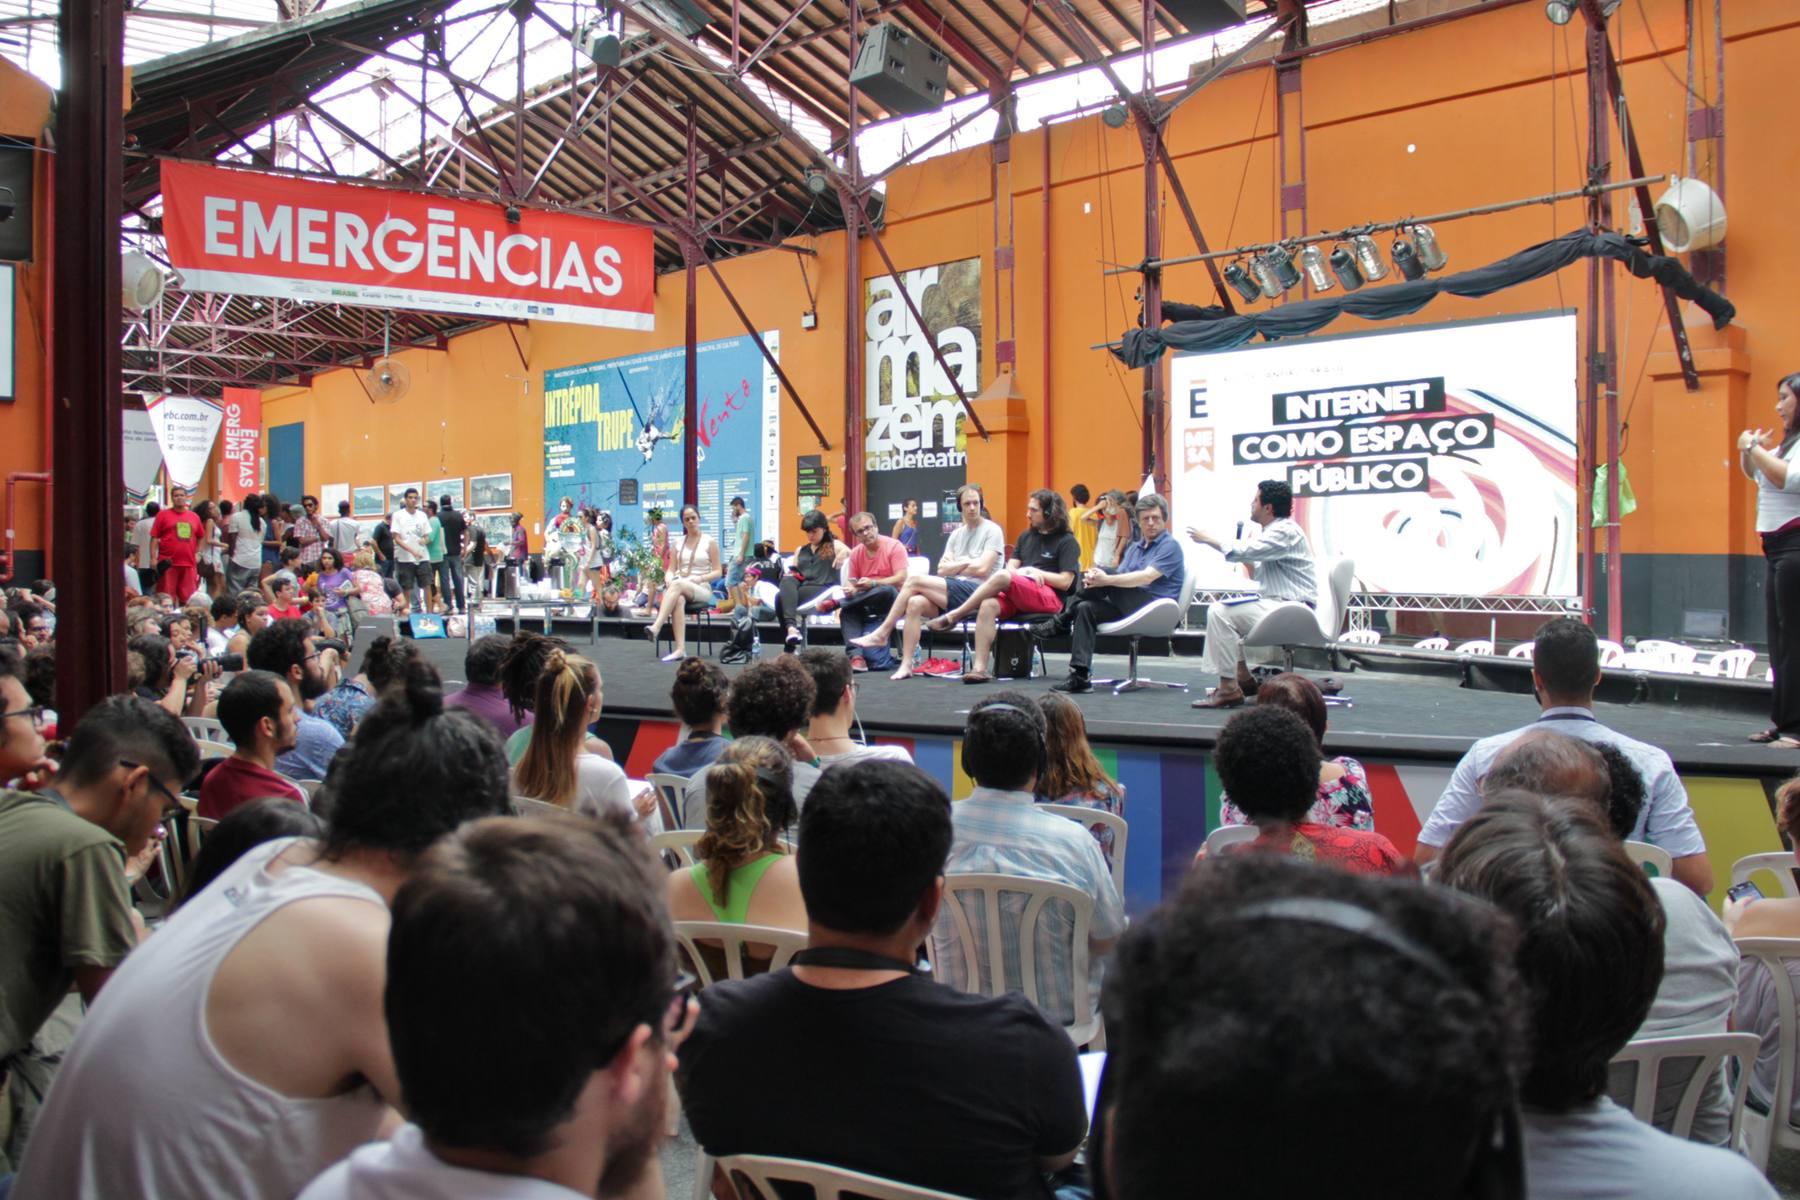 Emergencias_RJ_dez_2015_IMG_0240